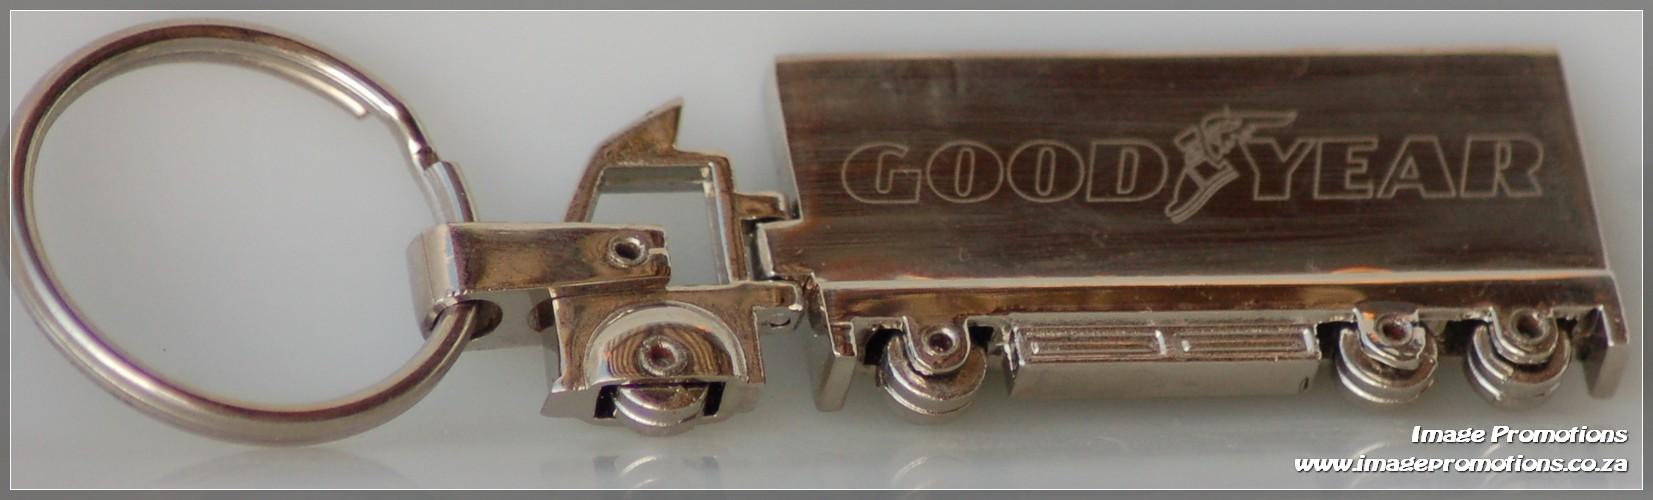 Goodyear Truck Keyring